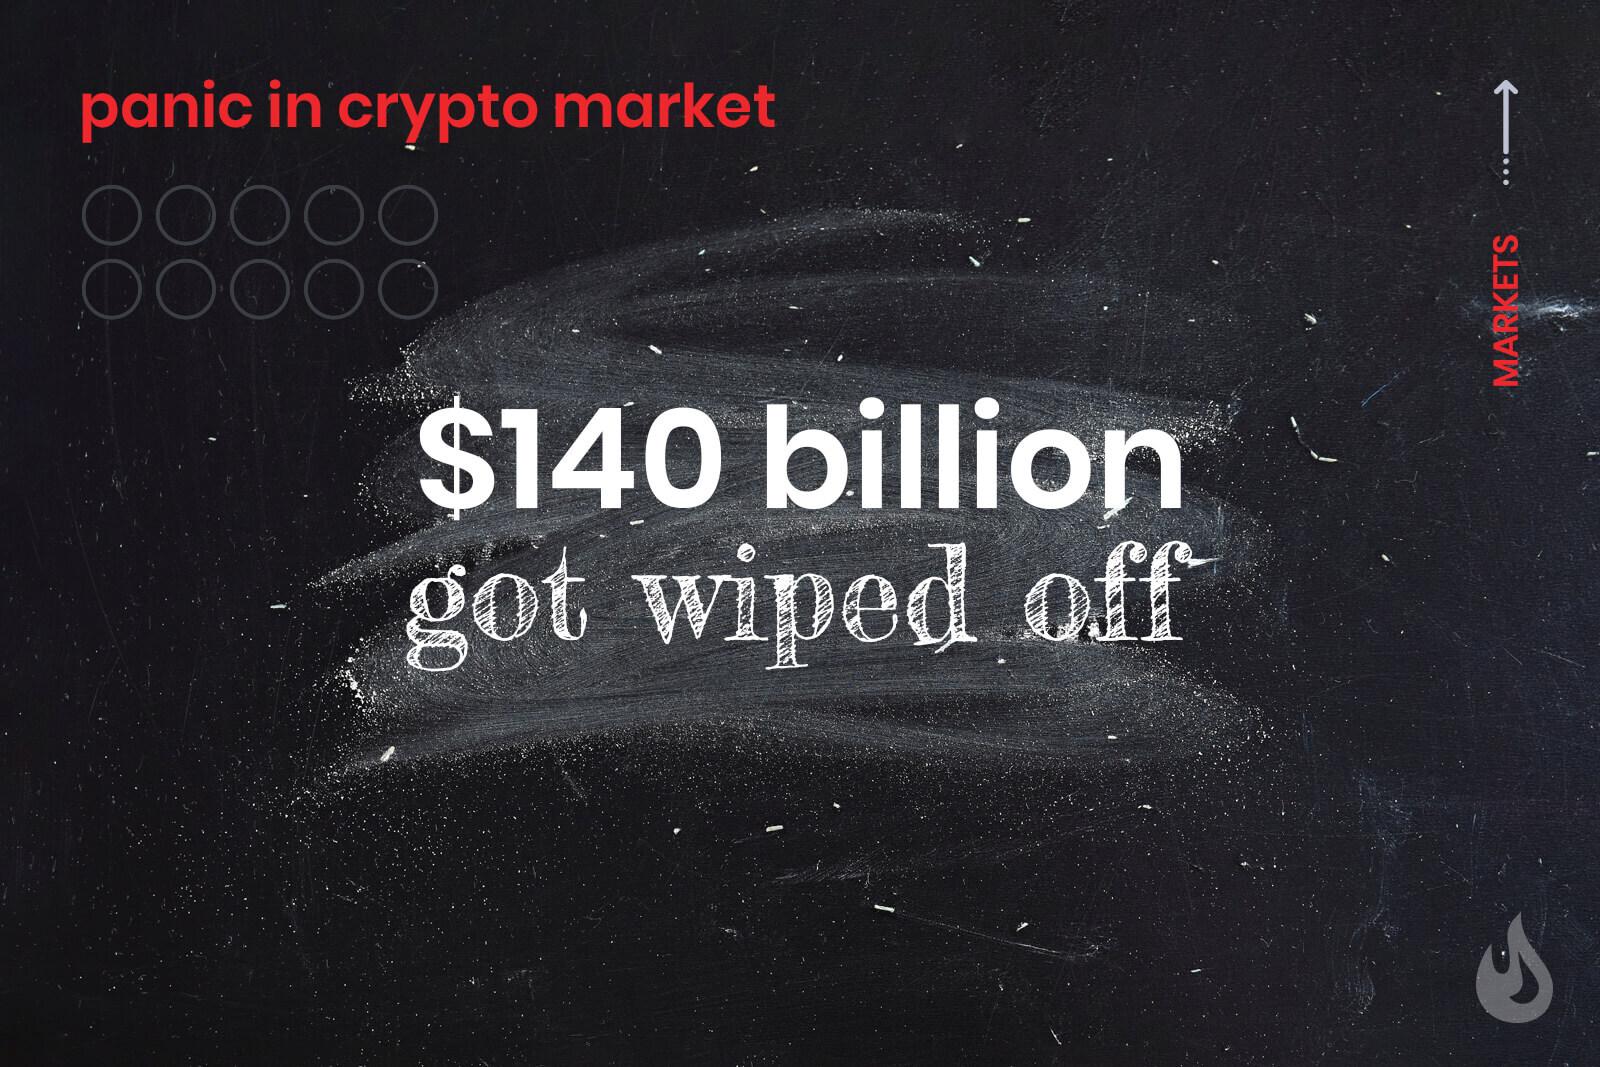 crypto market panic liquidation